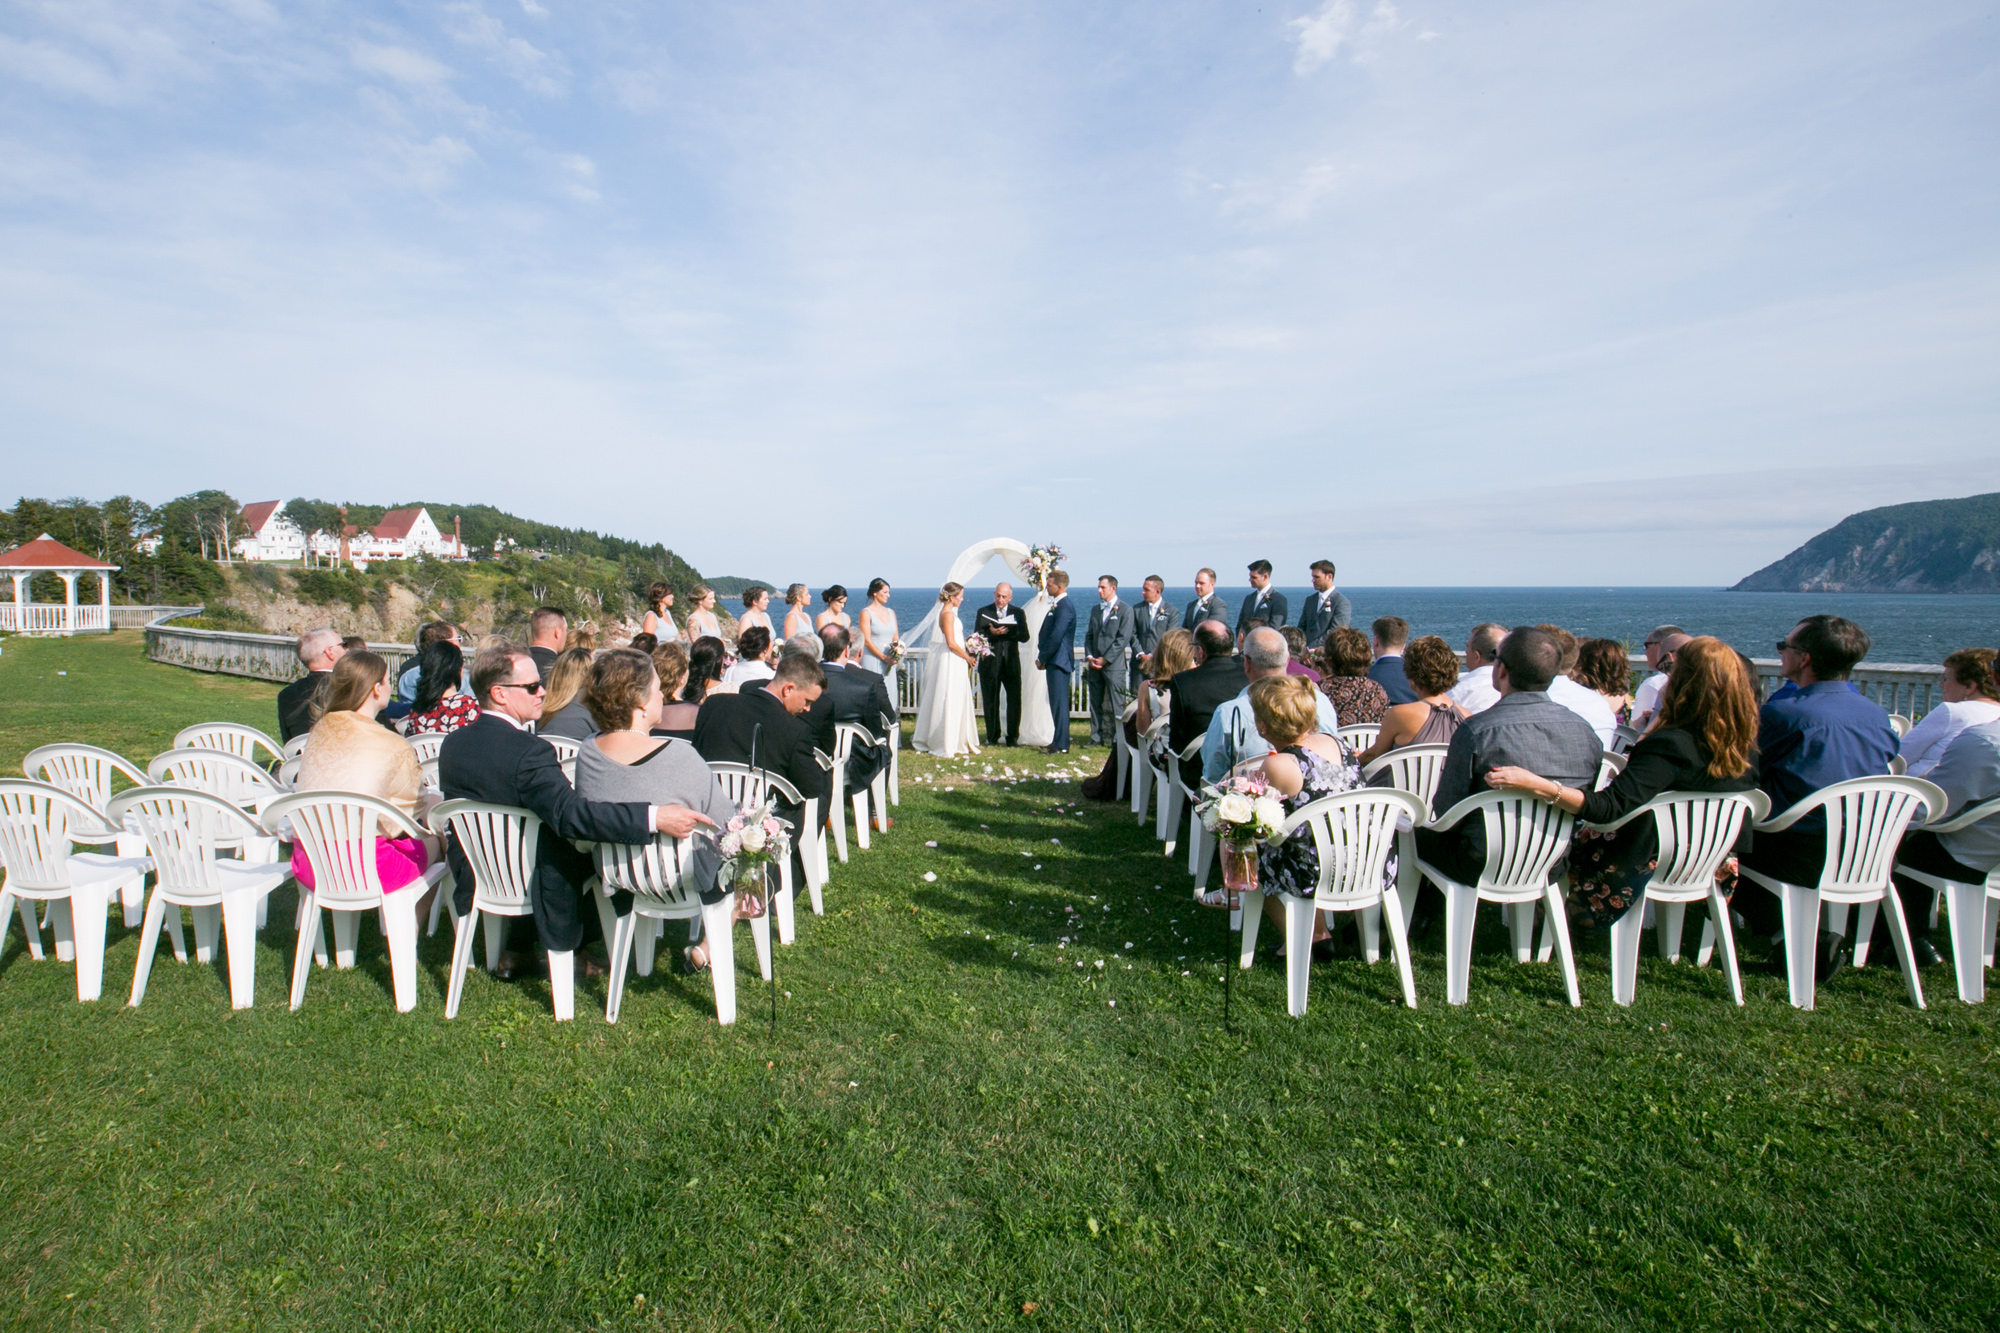 102-keltic-lodge-wedding-.jpg